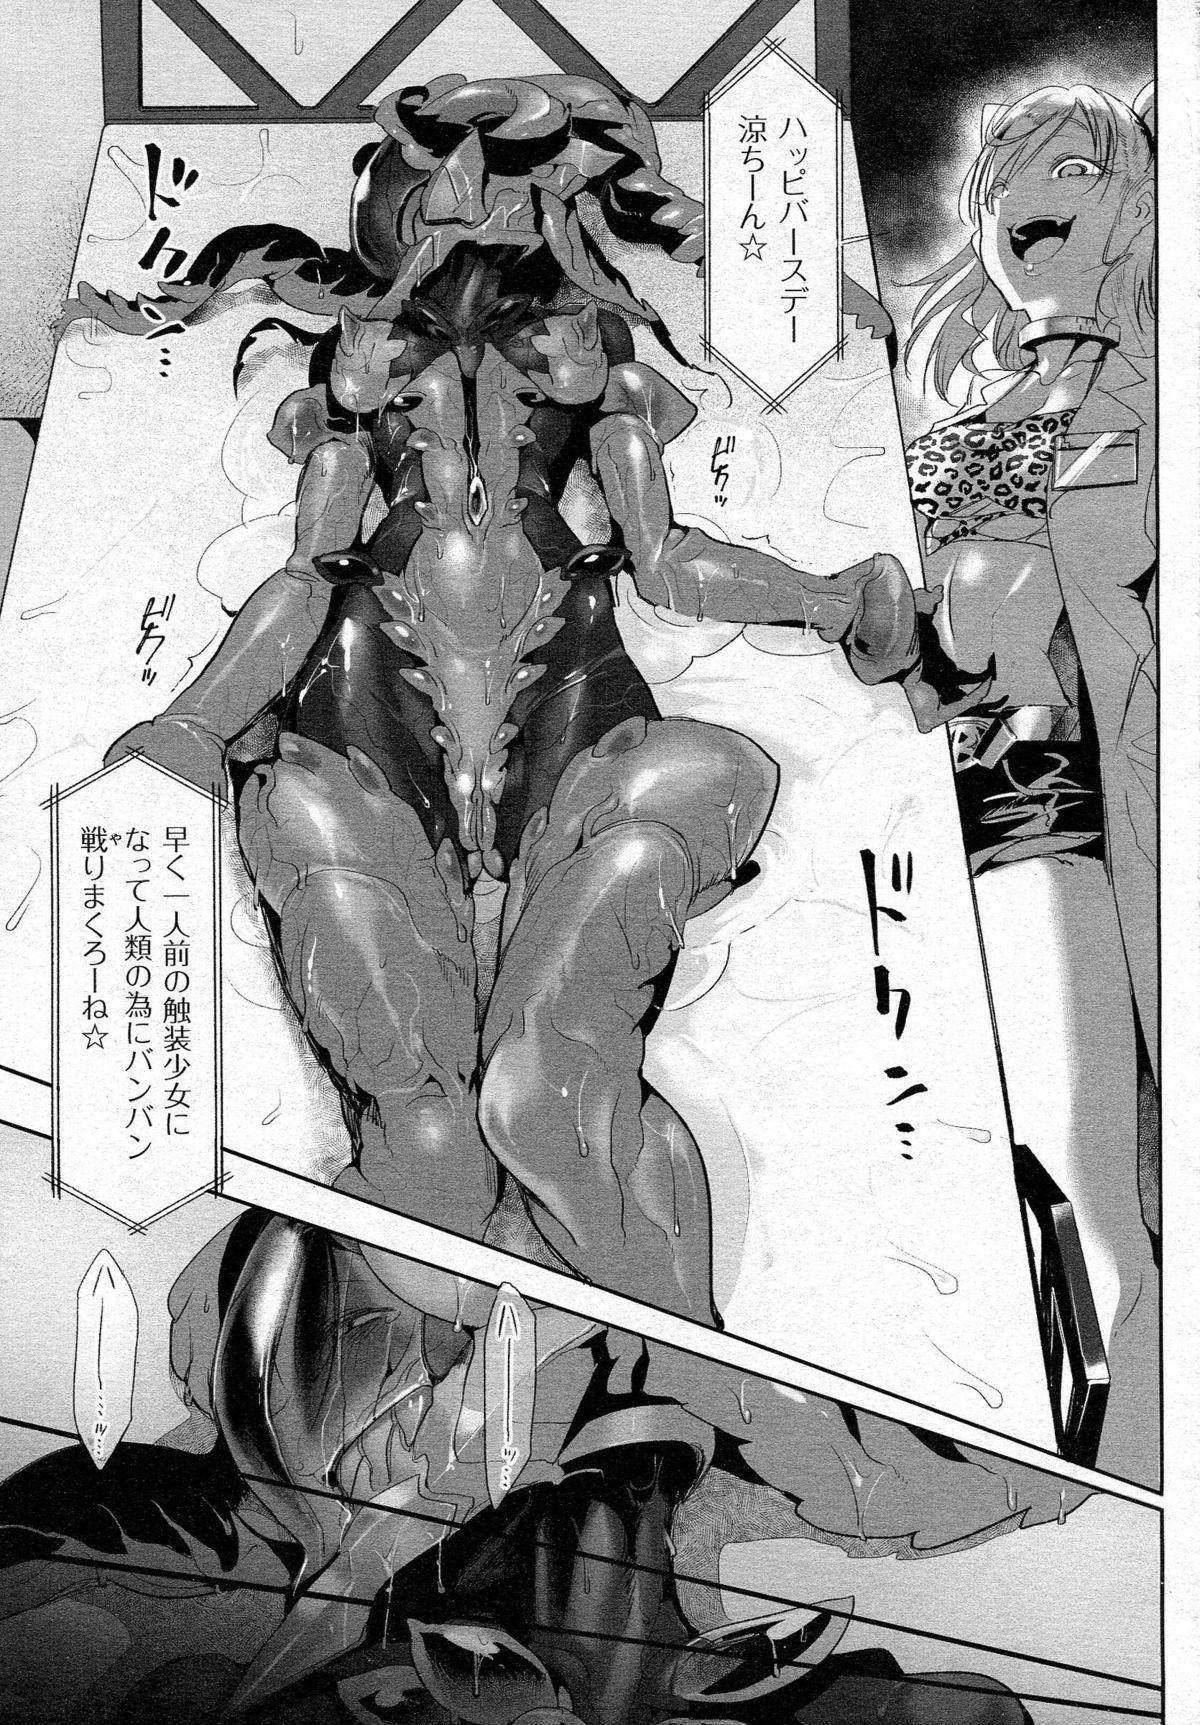 COMIC Unreal 2015-06 Vol. 55 + Hisasi Illust Shuu 241